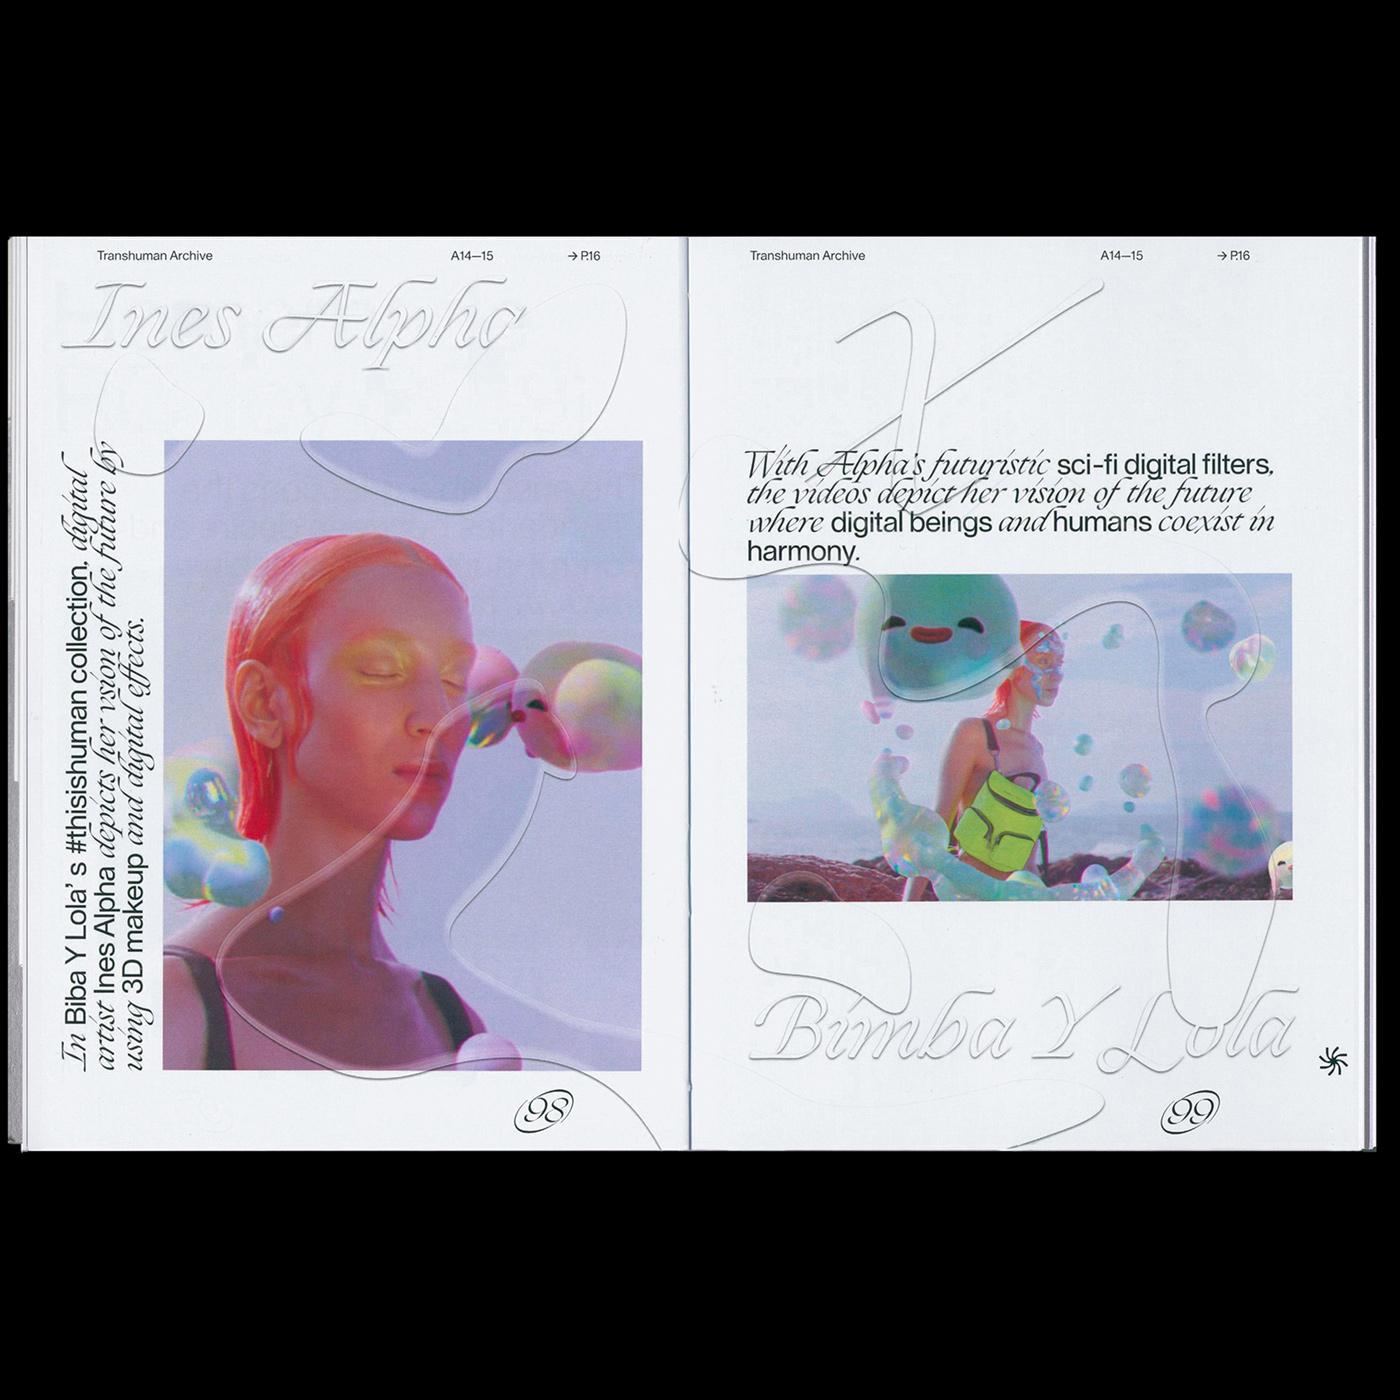 10 collide24 Transhuman Archive Stella Klump Leonie Krein Moritz Büsselberg - The book 'Transhuman Archive' by Stella Klump, Leonie Krein and Moritz Büsselberg explores the effects of transhumanism in our times